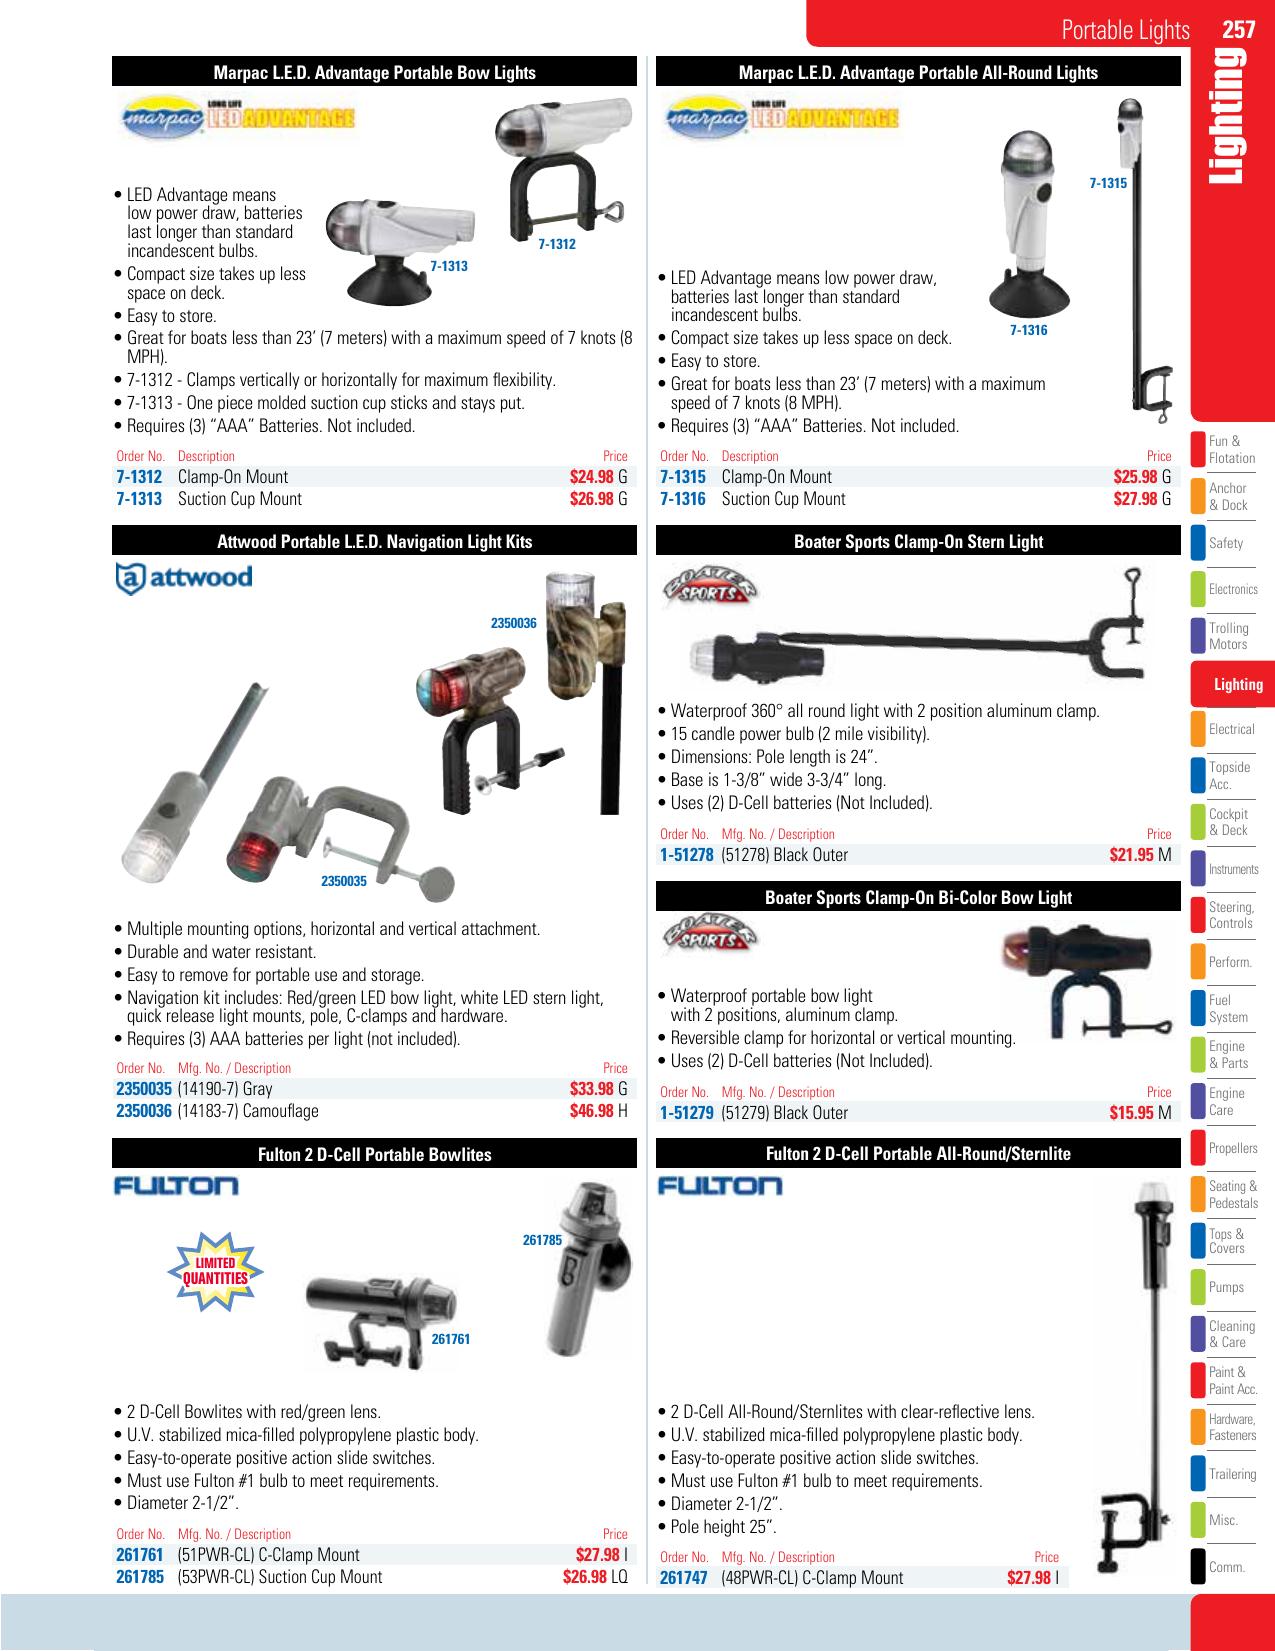 Security Lights 6//1 Watt 50 Watt Replacement Lamp Only Lumateq LED Landscape